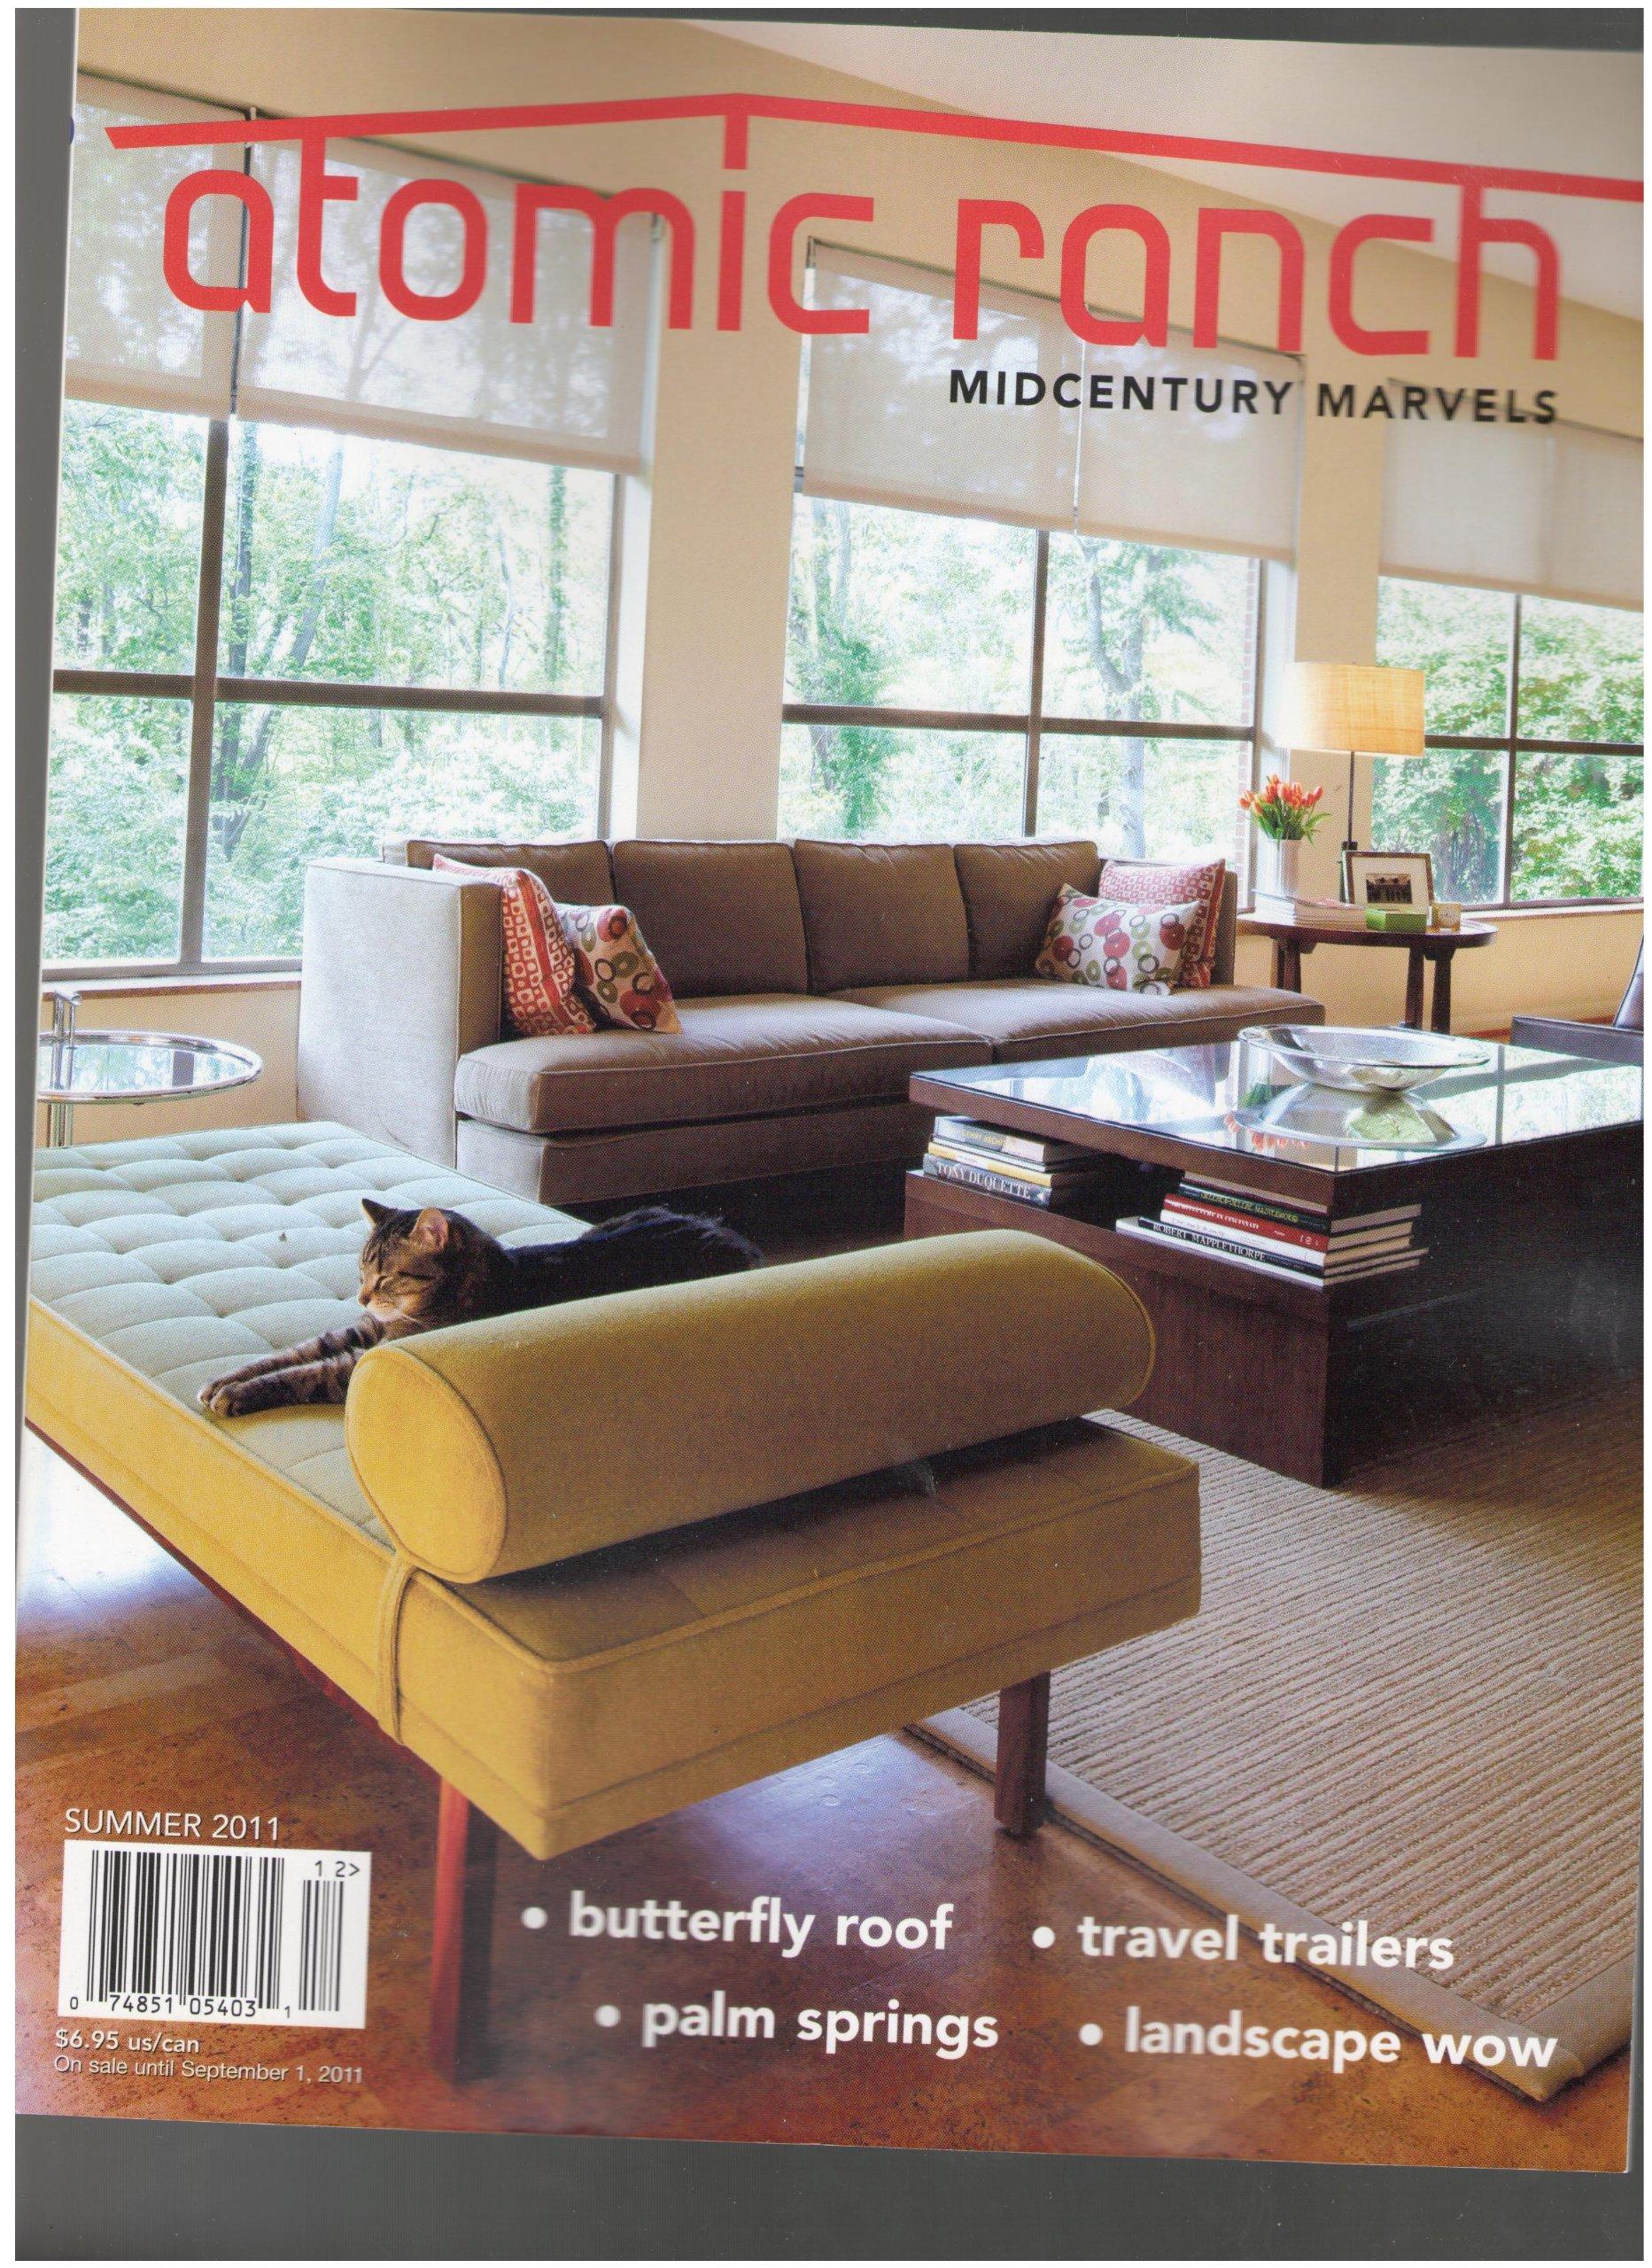 Atomic Ranch Magazine (Summer 2011) ebook